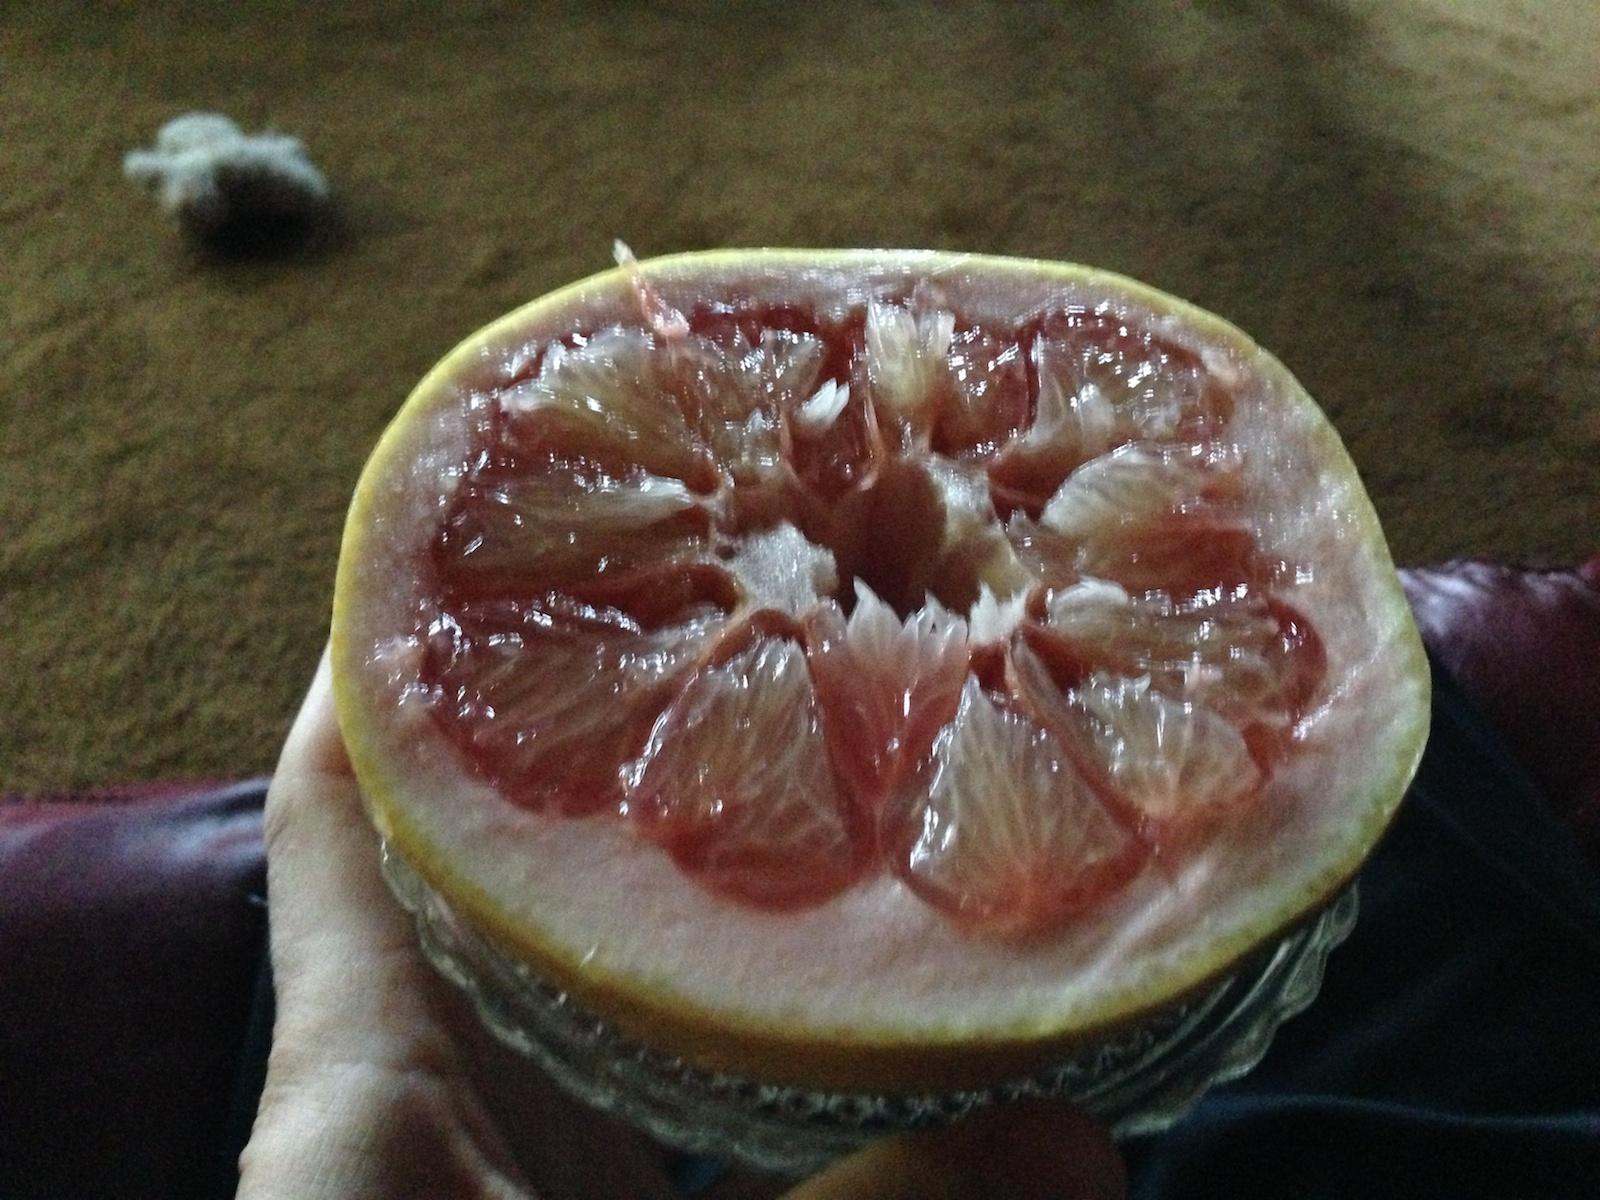 http://blog.rickk.com/food/2012/11/23/ate.2012.11.22.b1.jpg